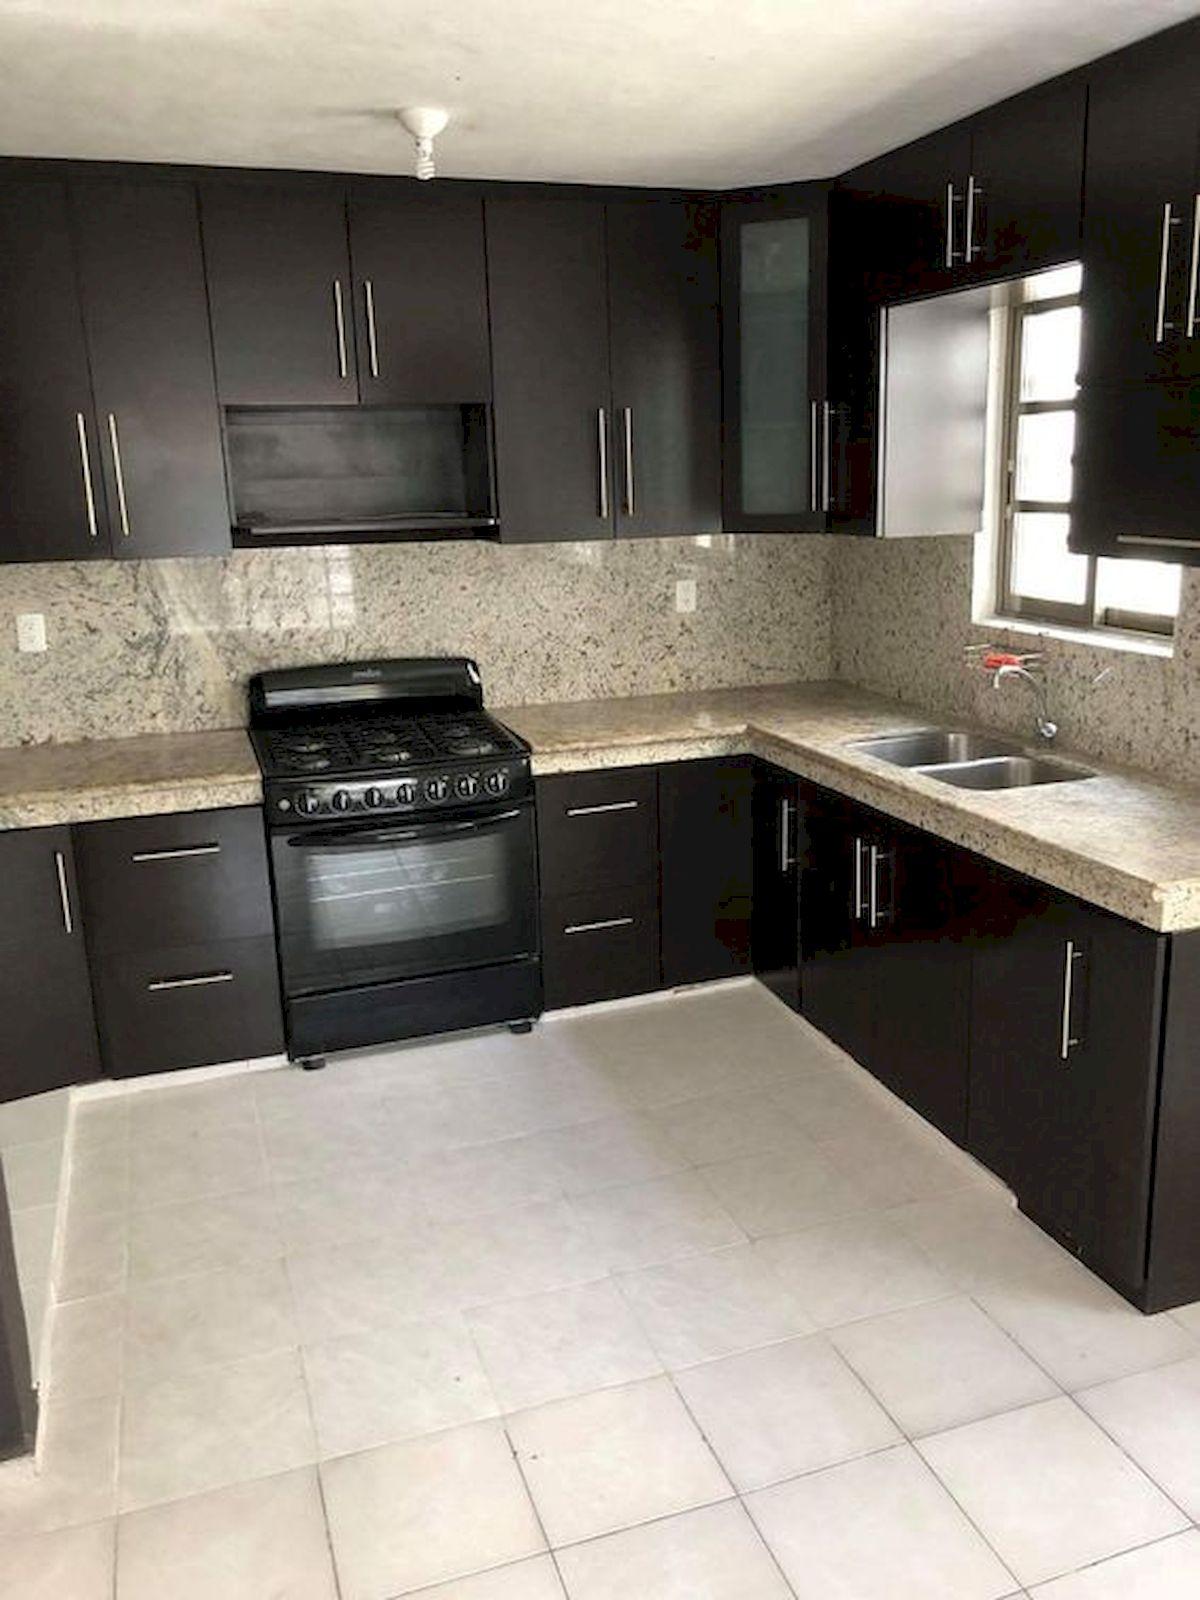 45 Easy Kitchen Decor and Design Ideas (14)